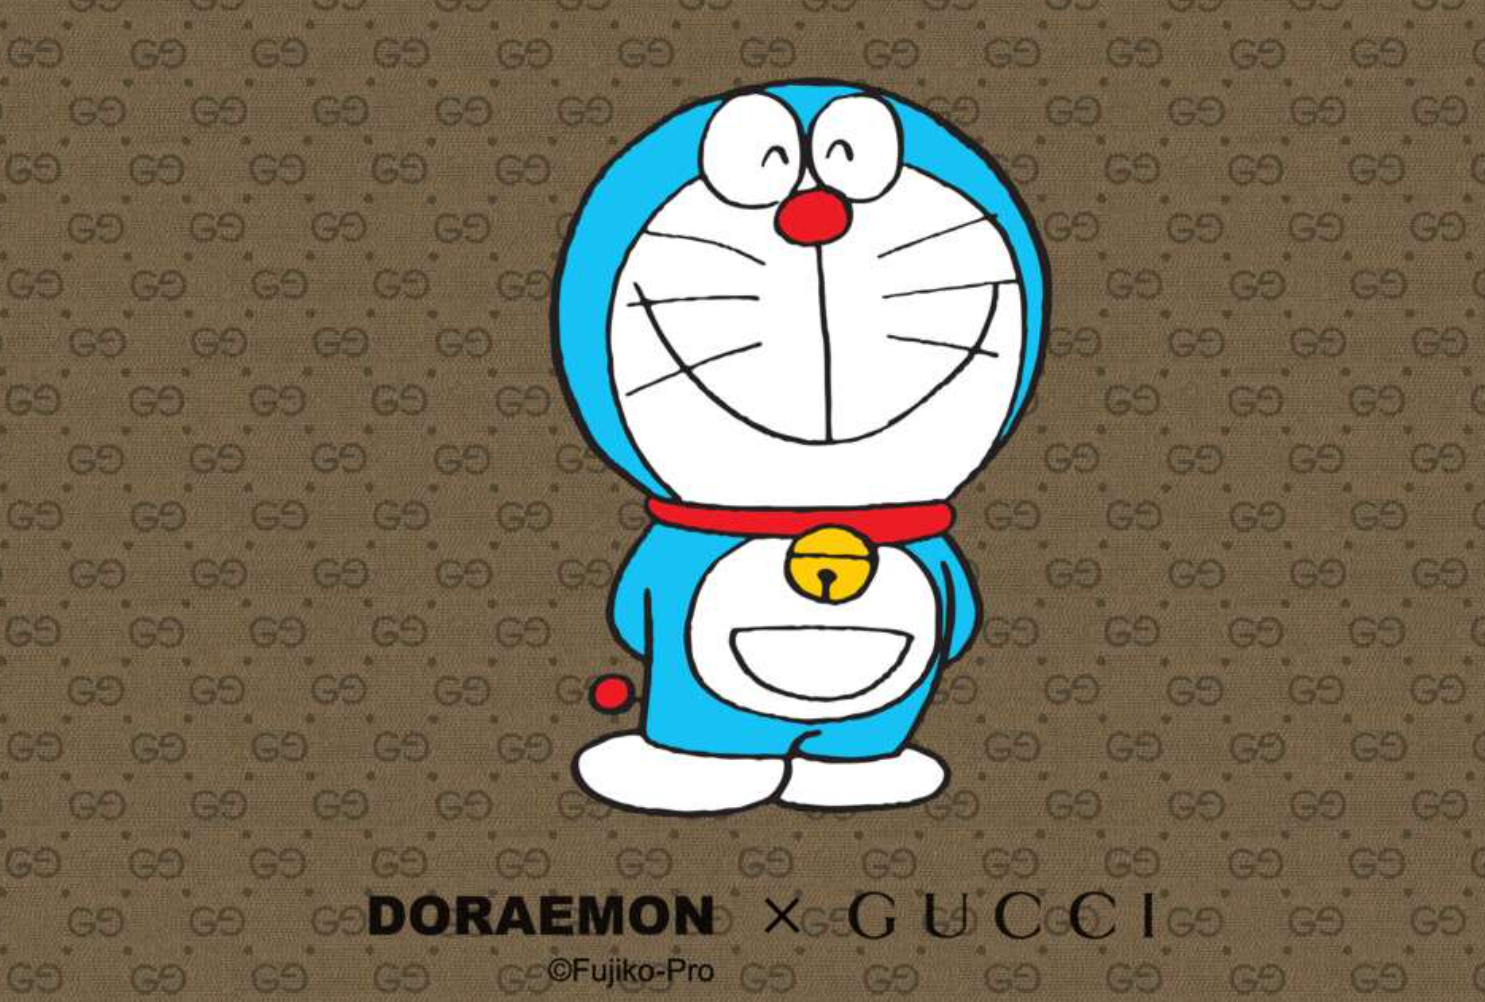 DORAEMON_GUCCI_哆啦A梦_古驰202012271543_088